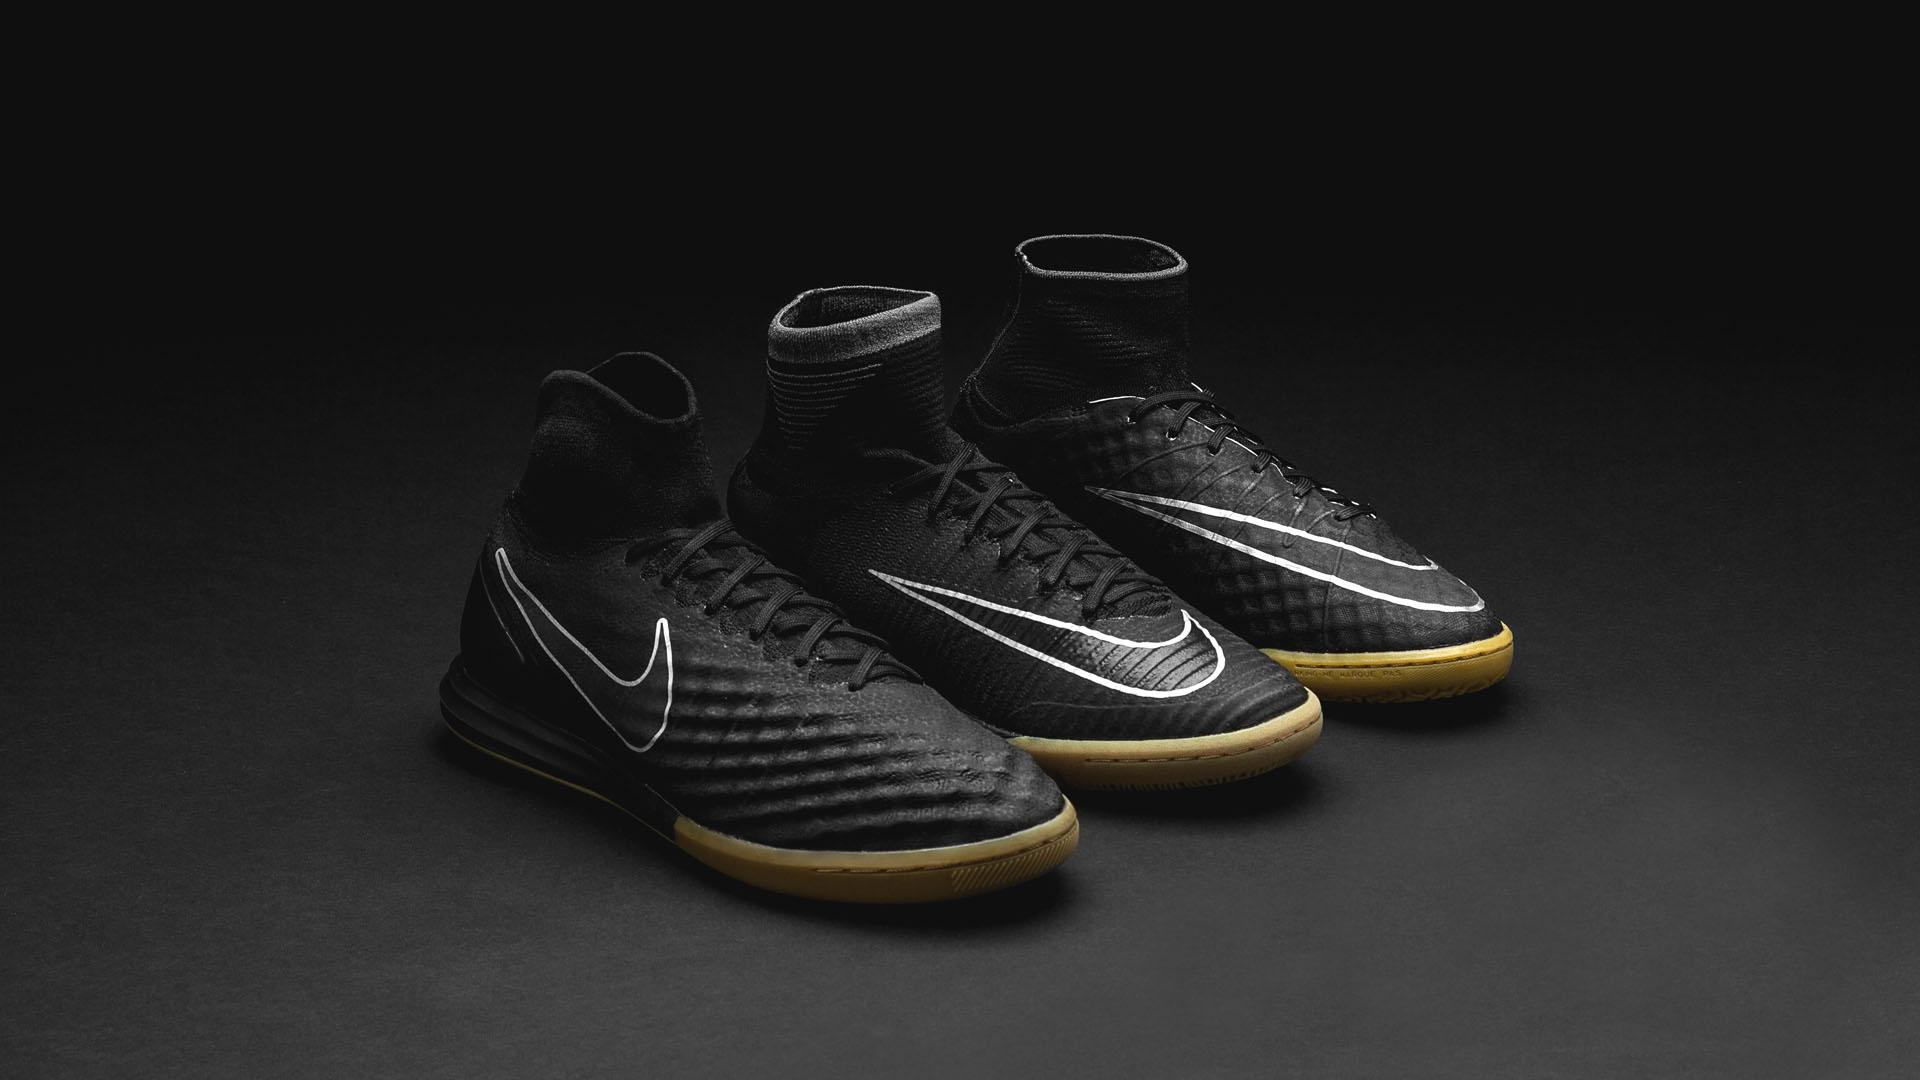 4b9feb27c Nike FootballX Pitch Dark Pack